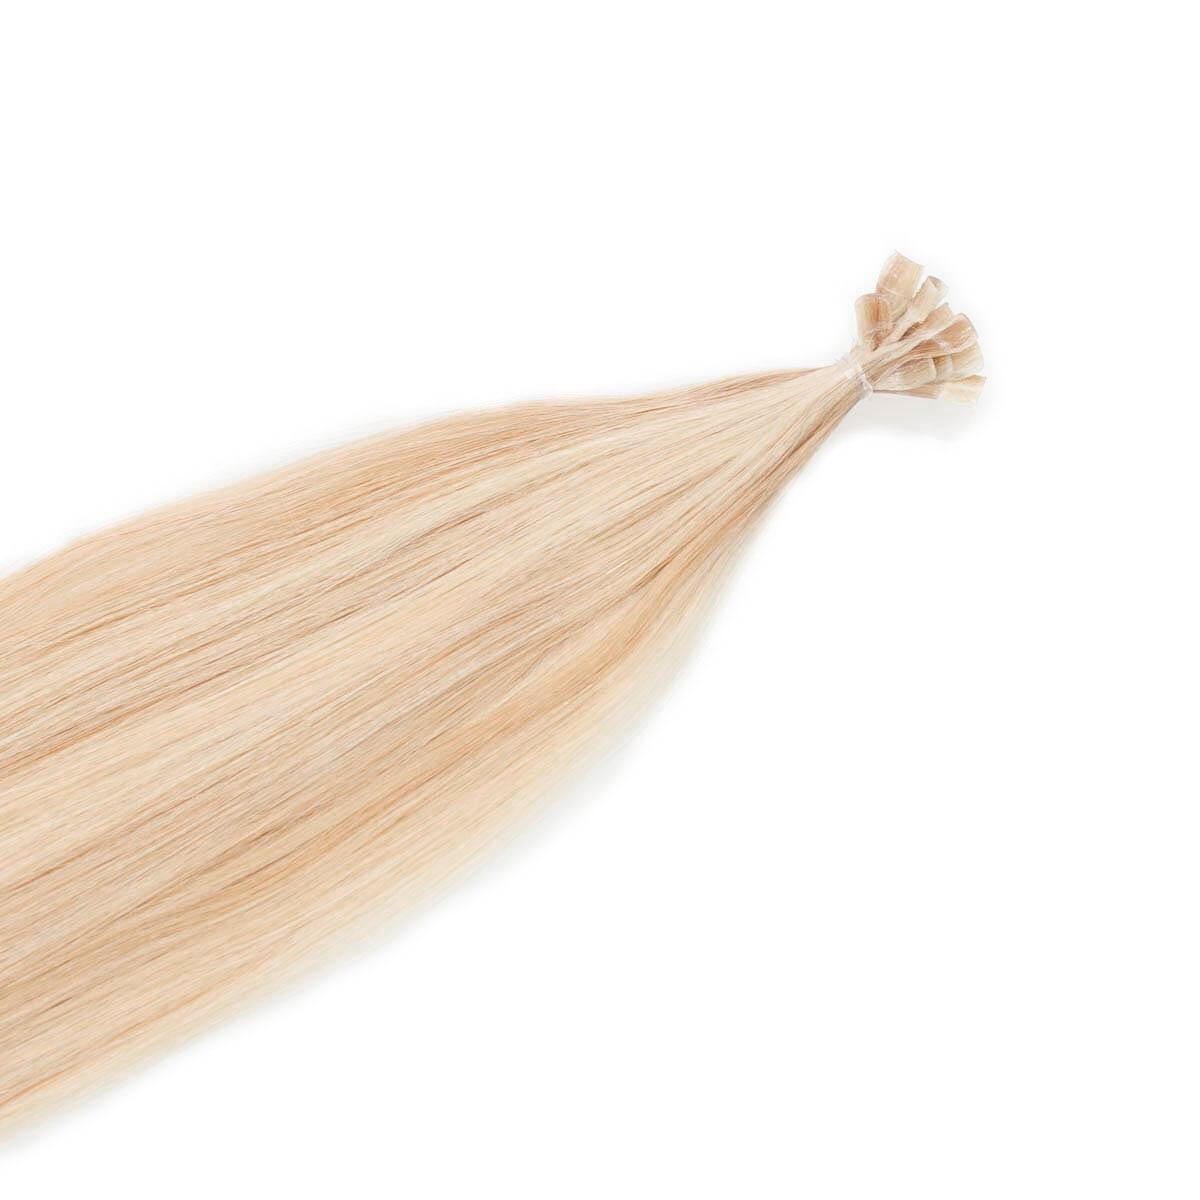 Nail Hair Premium M7.5/10.8 Scandinavian Blonde Mix 50 cm